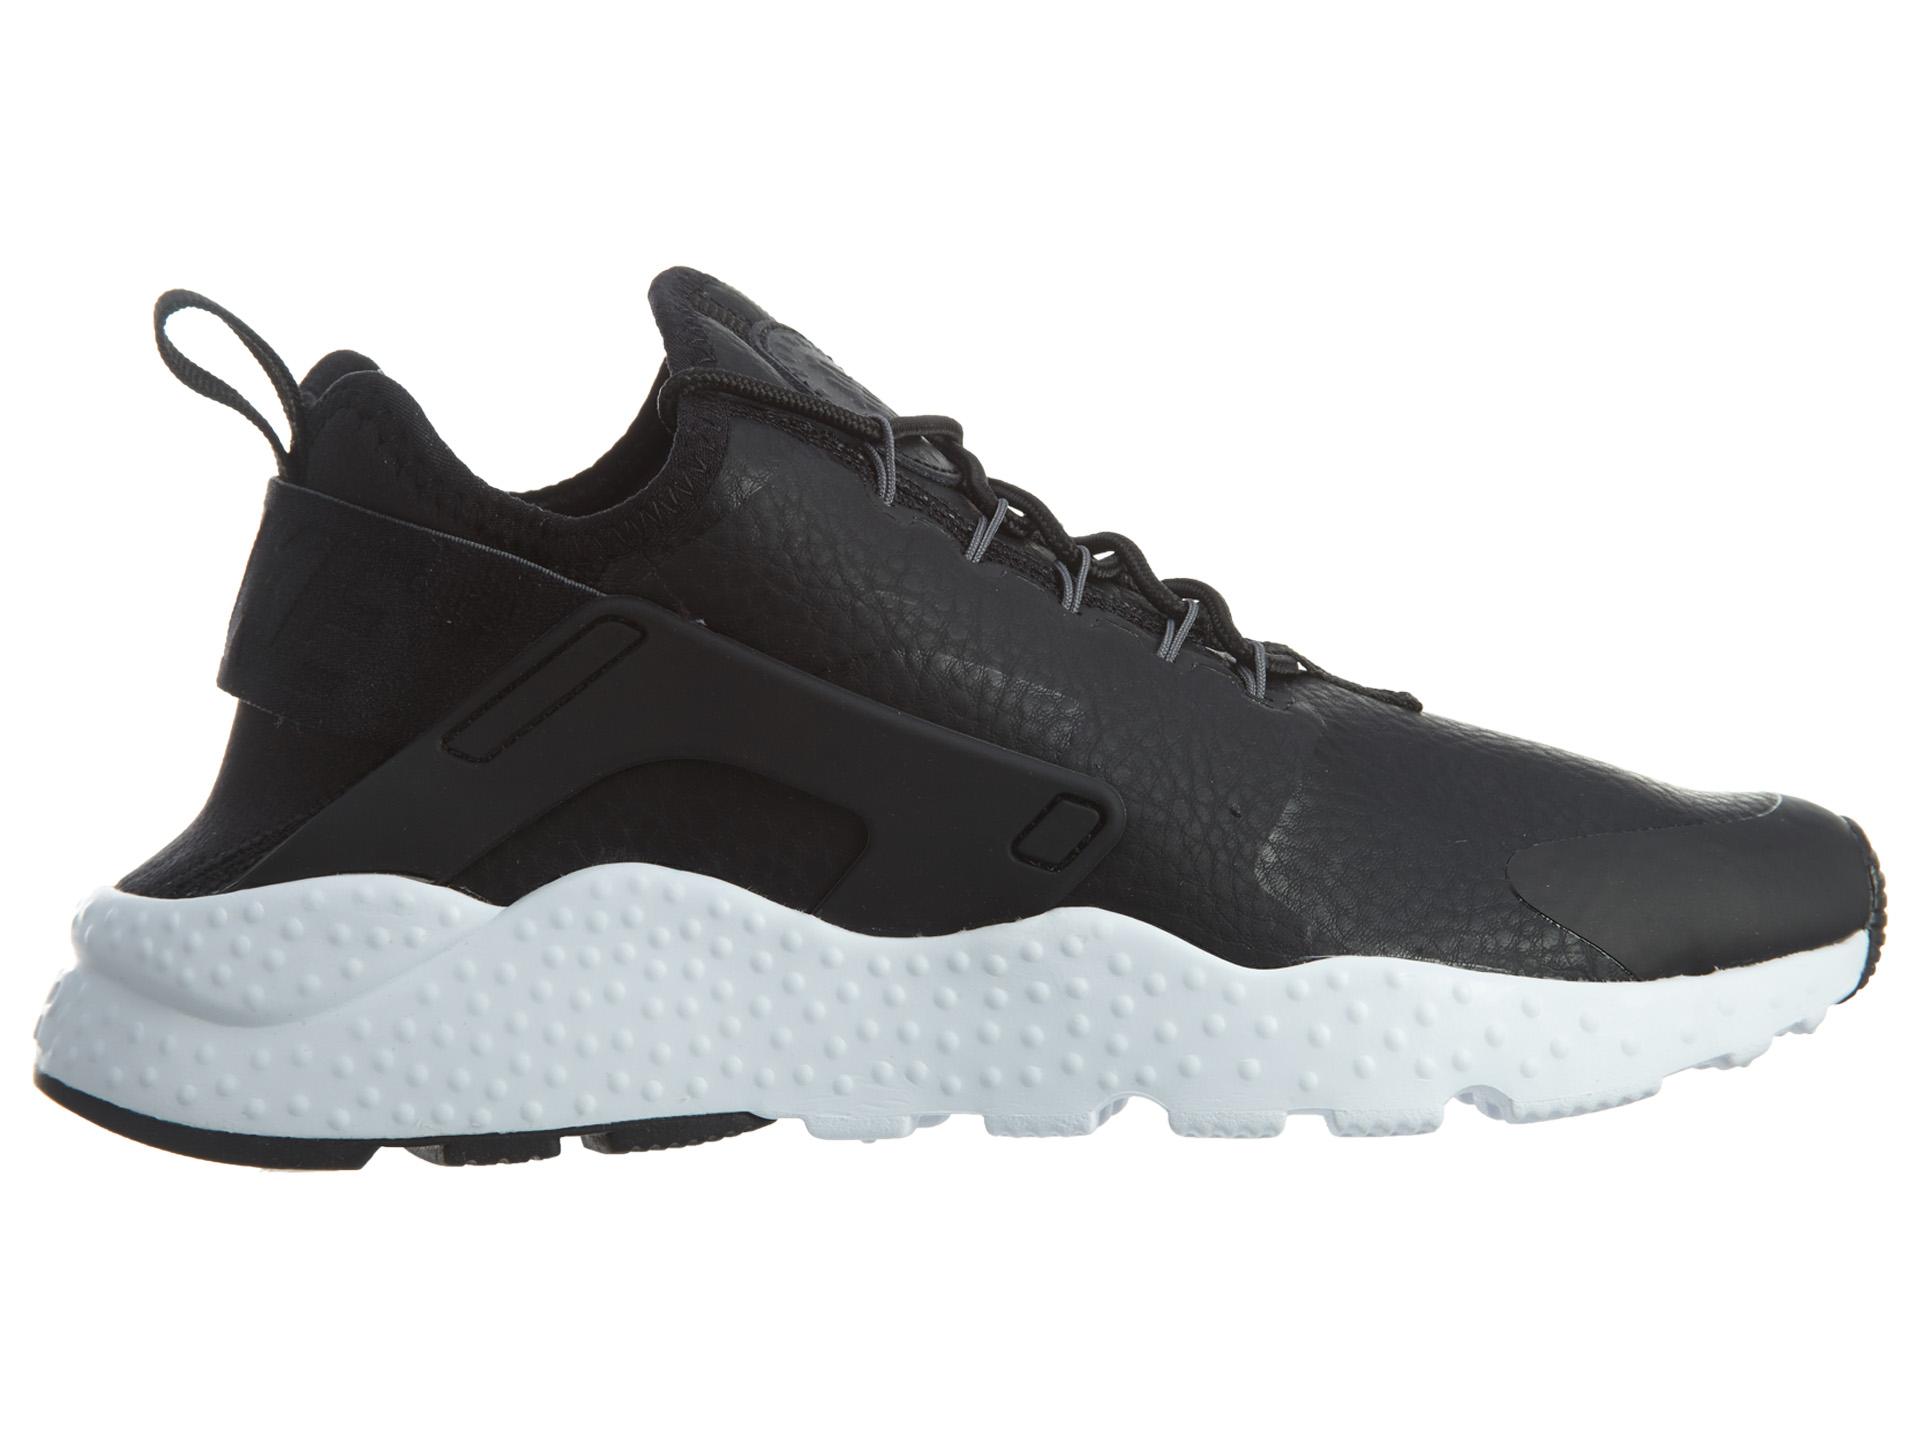 Nike Air Huarache Run Ultra Prm Black Dark Grey-White (W)